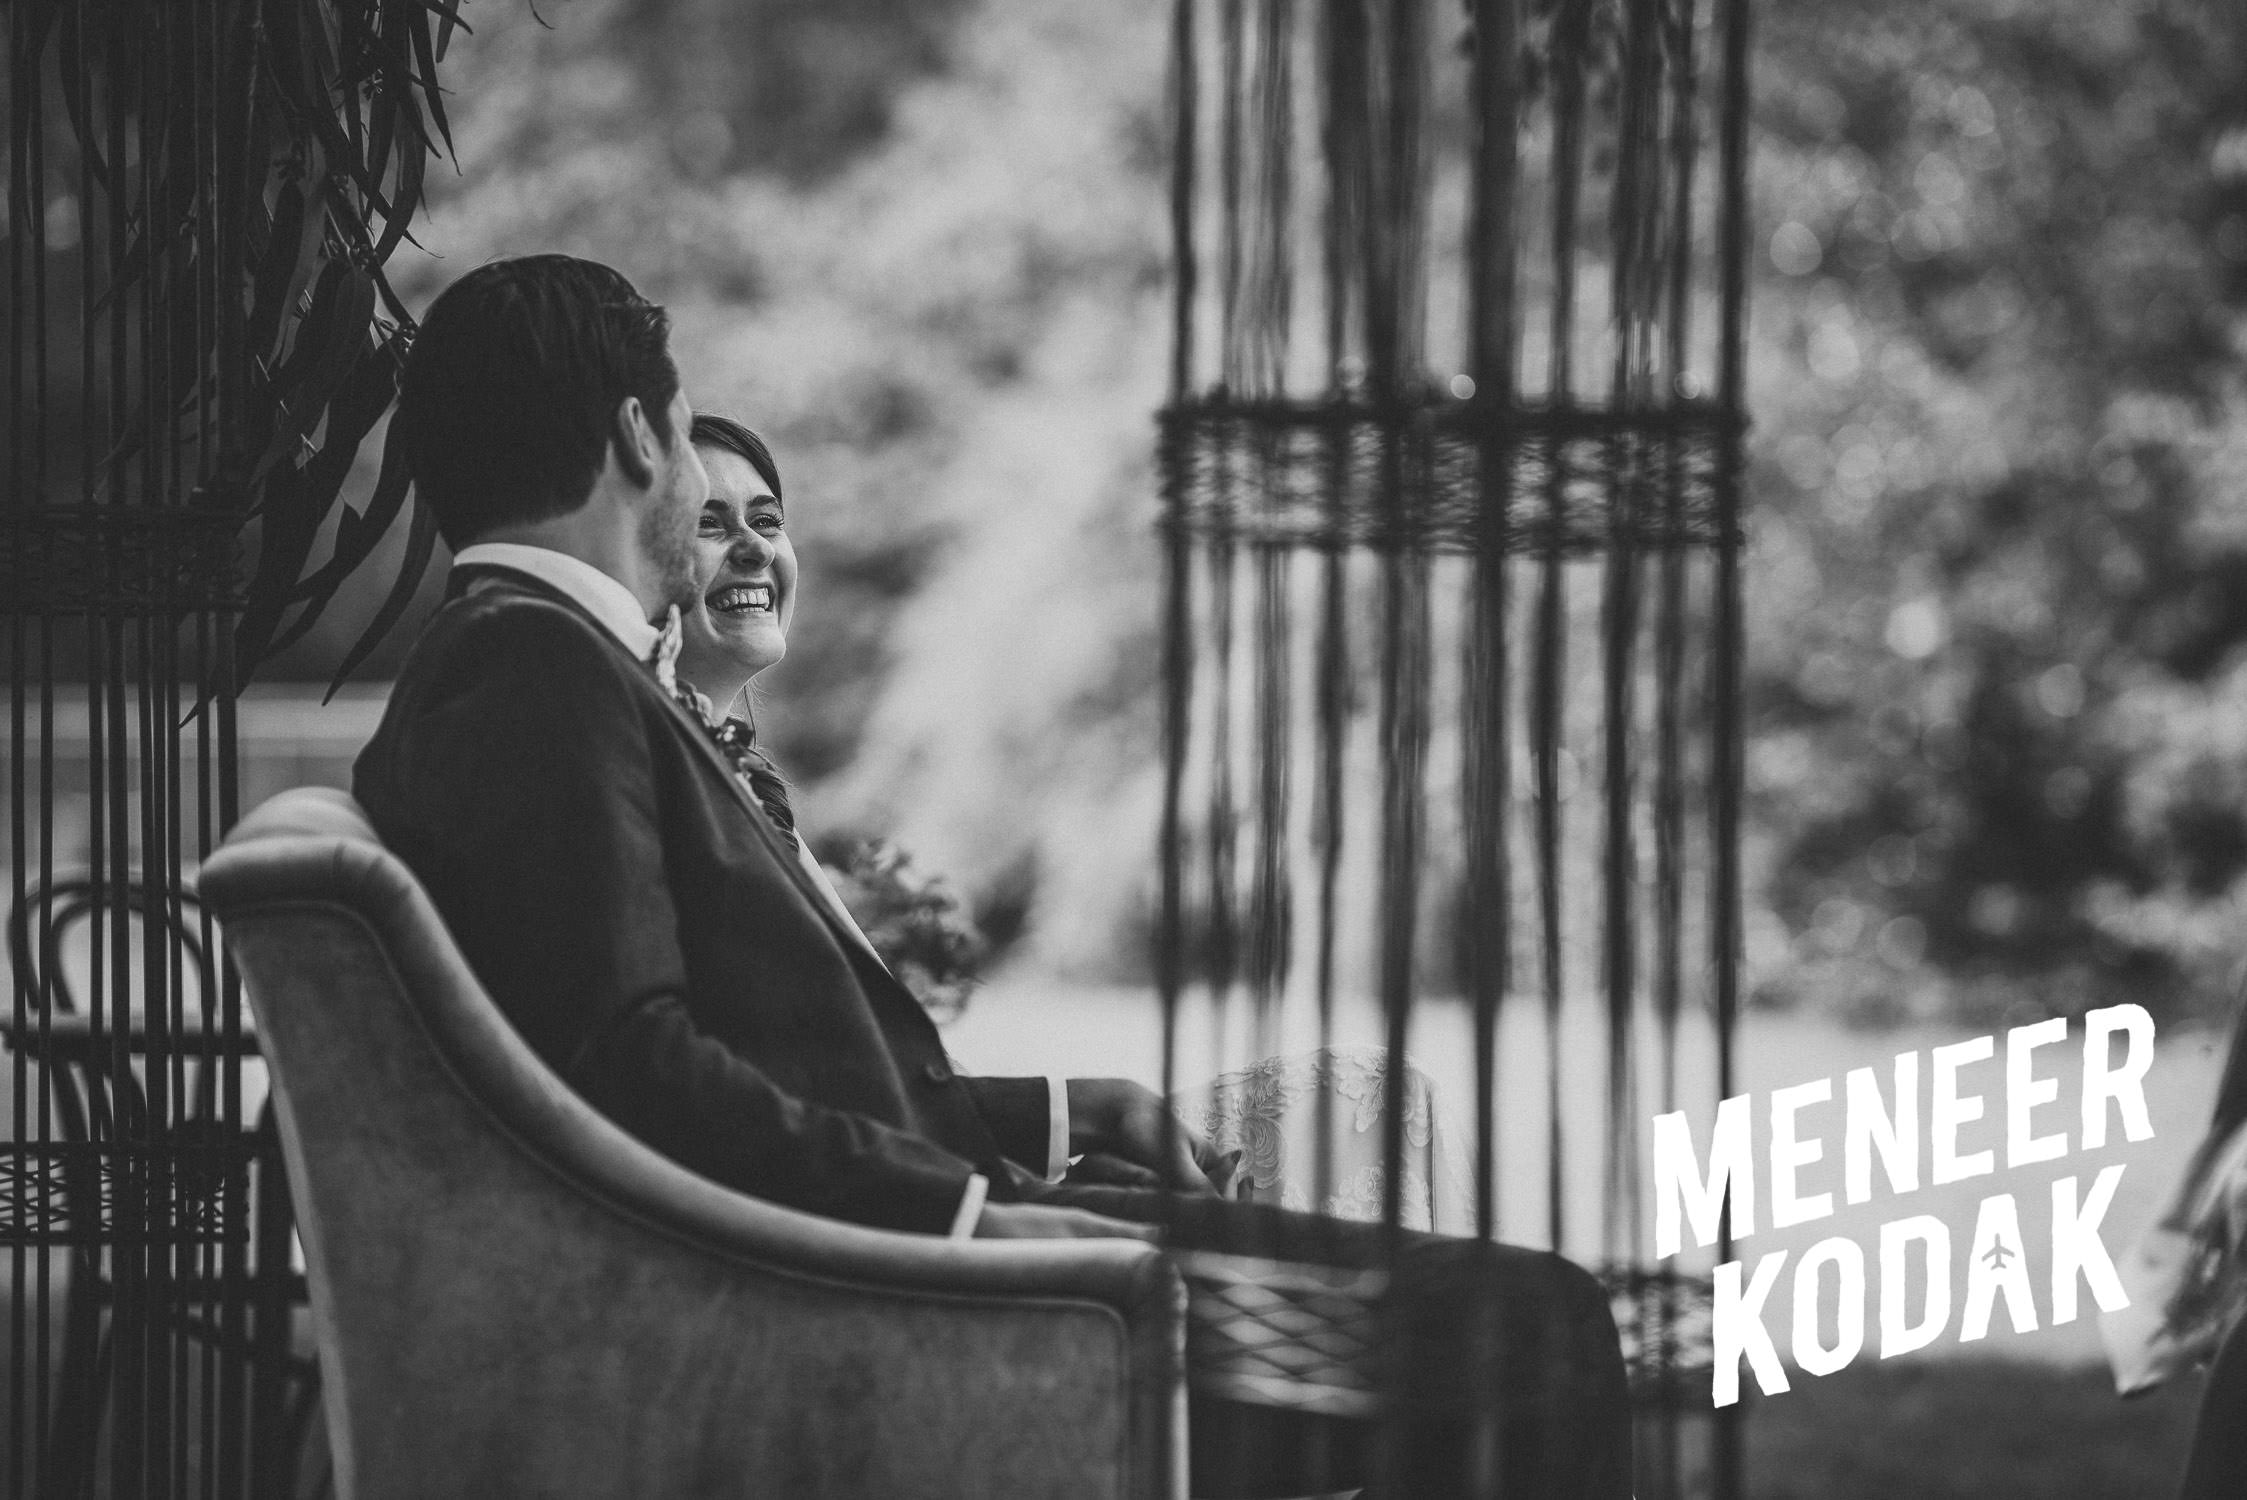 Meneer Kodak - Trouwreportage - Breda - E&M-105.jpg